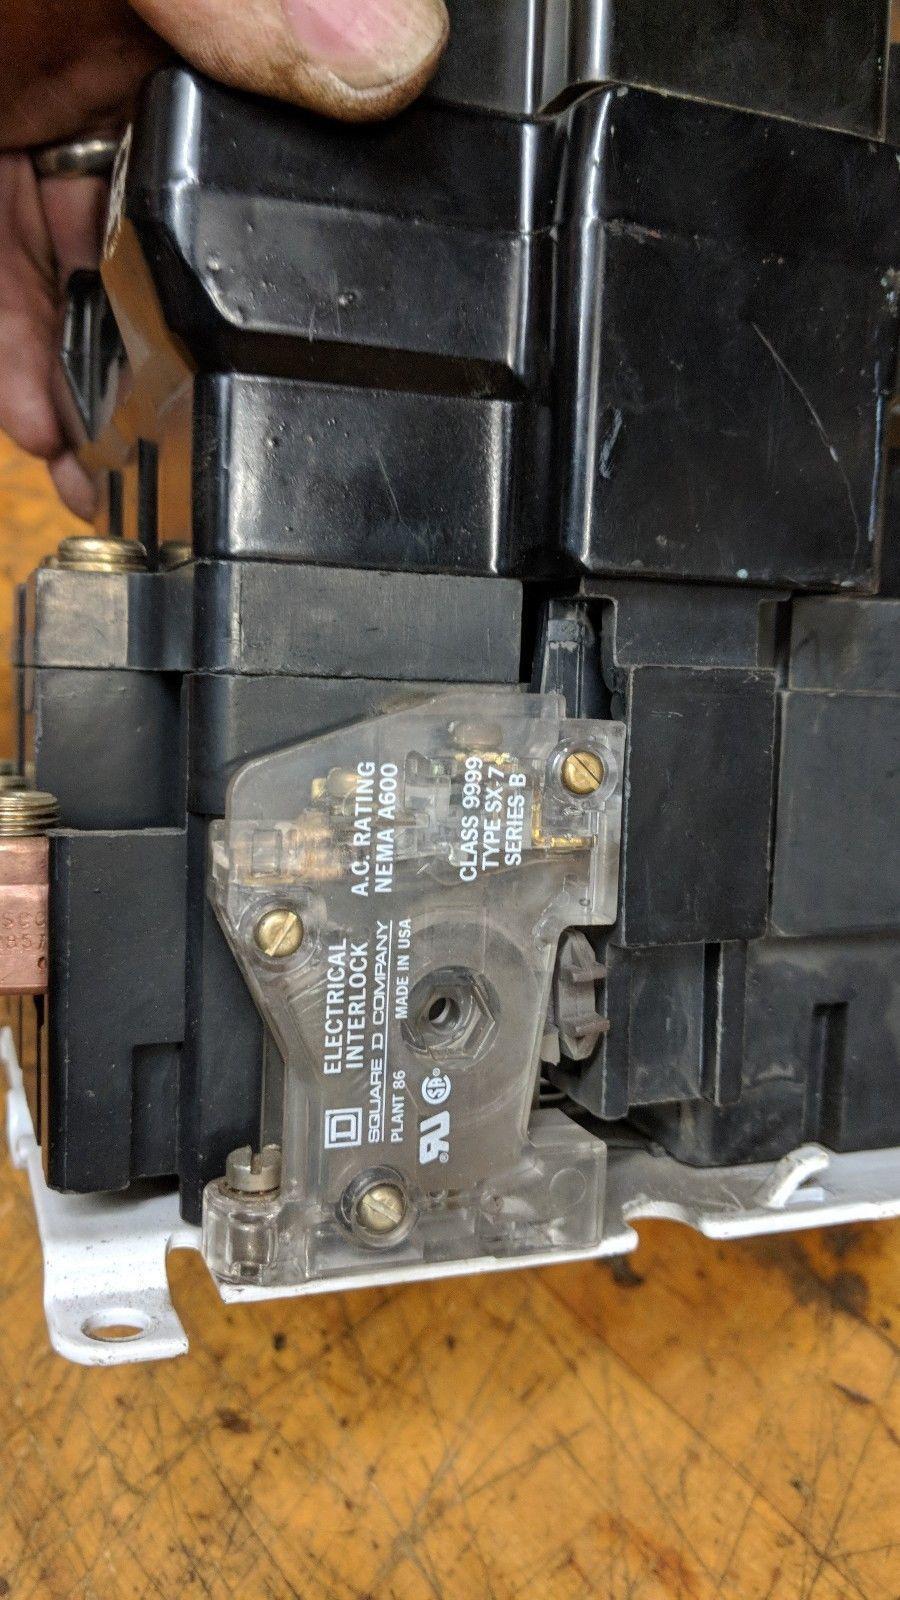 SQUARE D 8502 SEO2 MOTOR STARTER NEMA SIZE 3 SERIES A, 25 30 50 HP 208 v coil